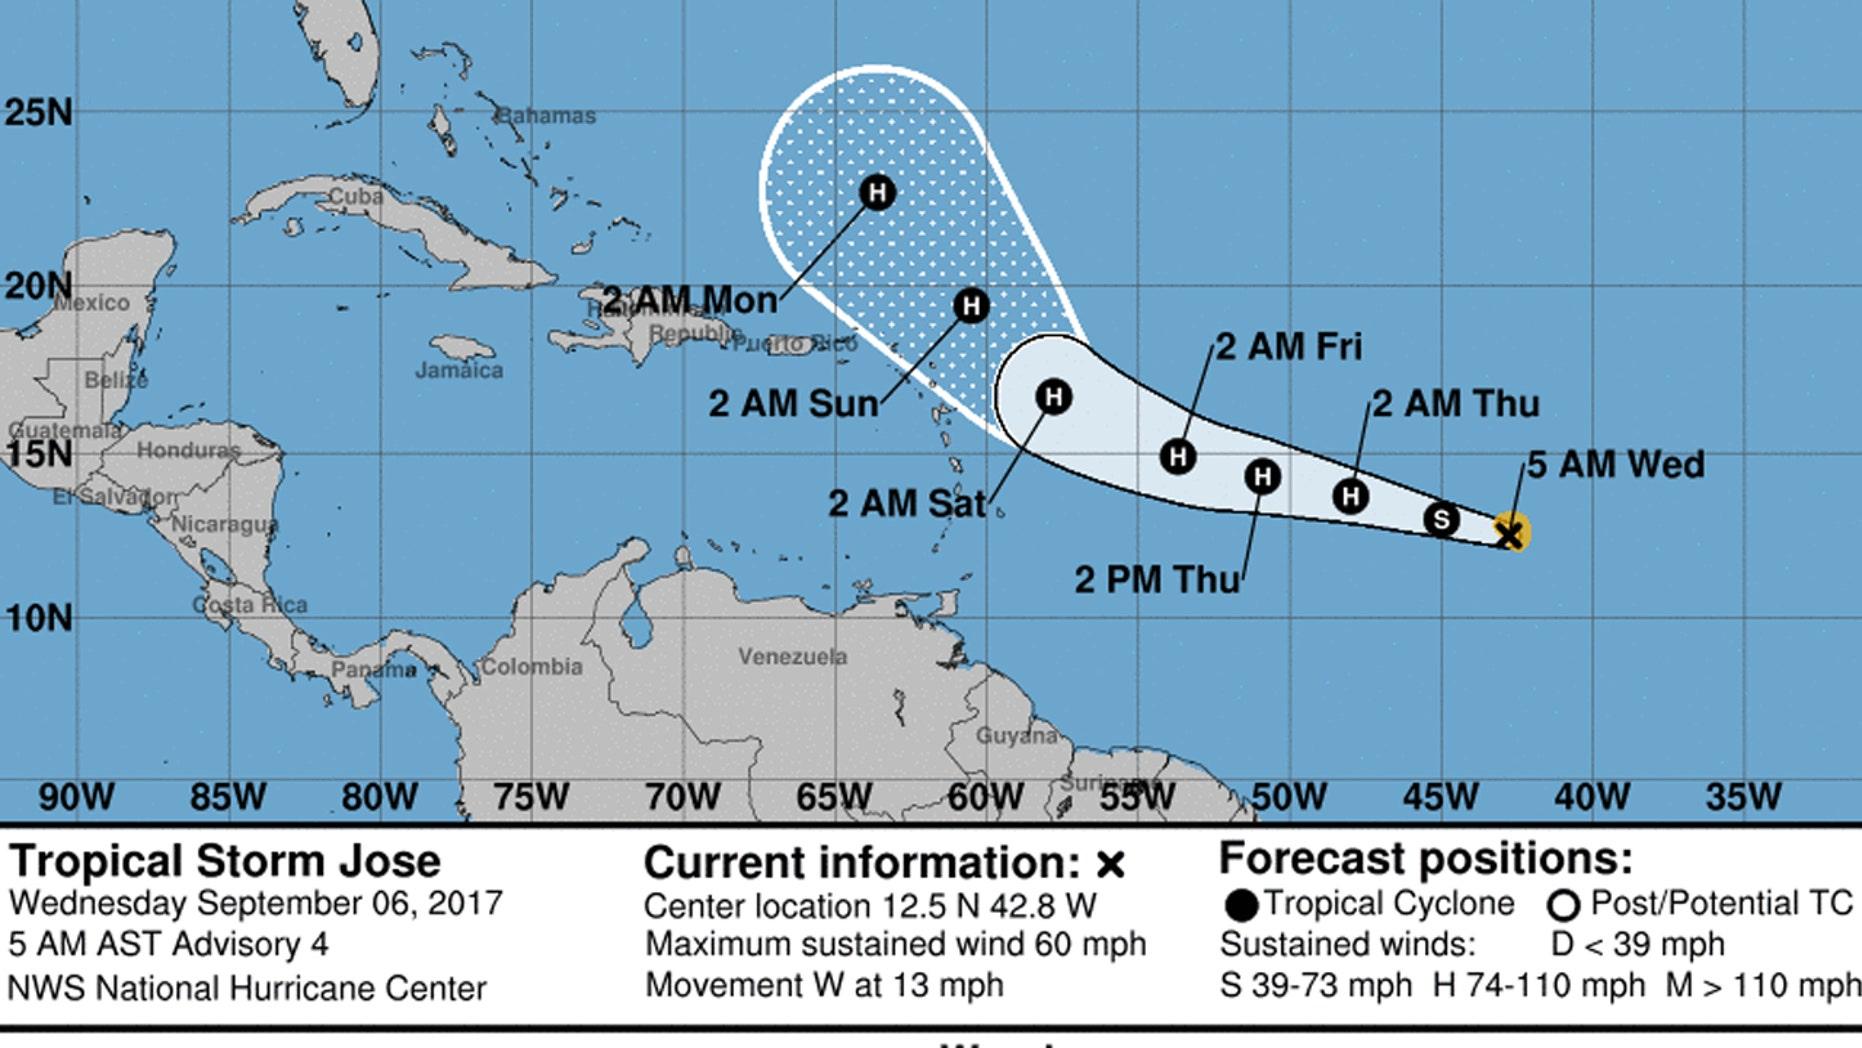 The forecast track of Tropical Storm Jose.